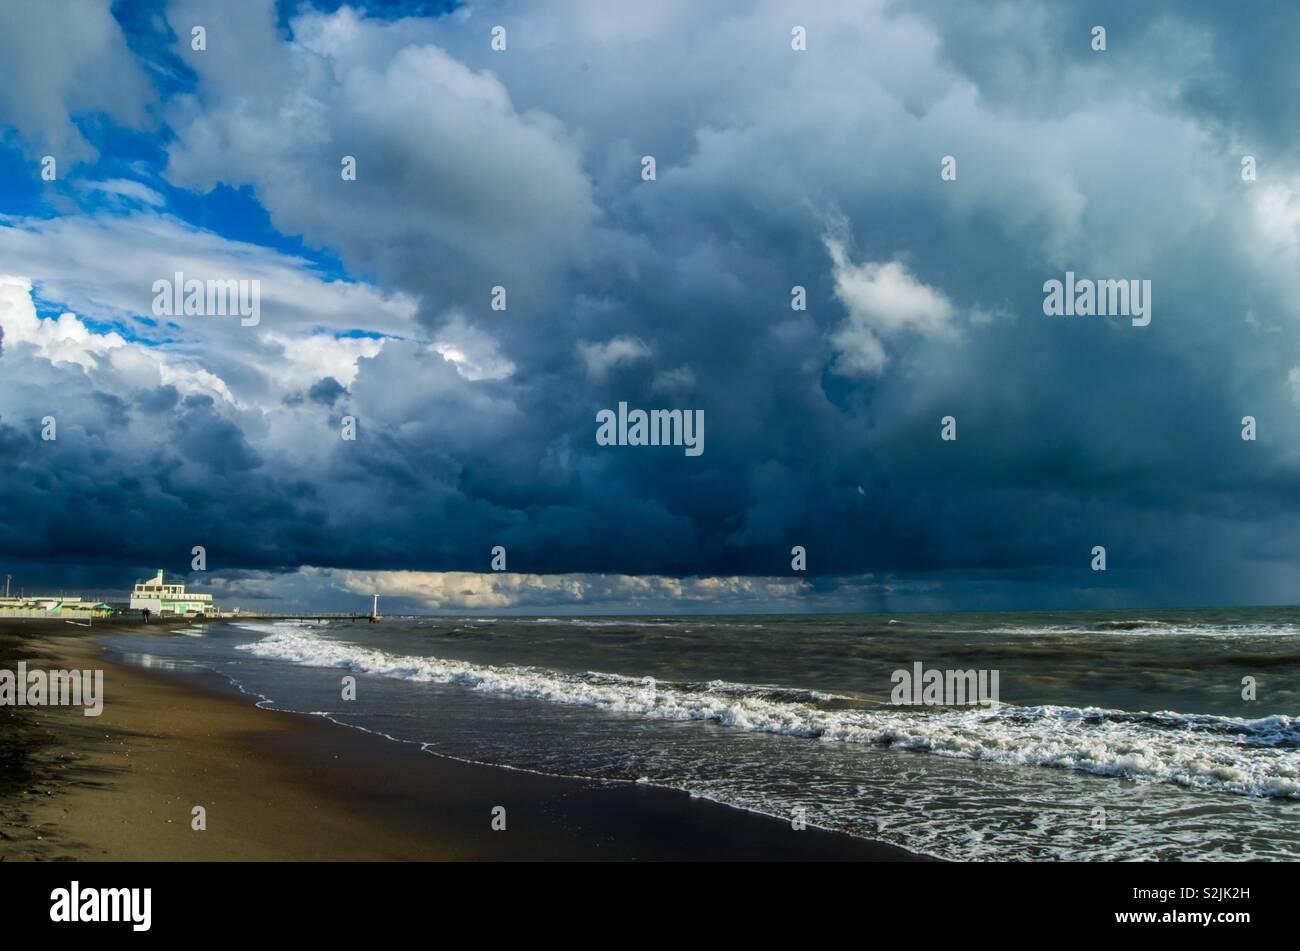 Dramatic sky above sea - Stock Image